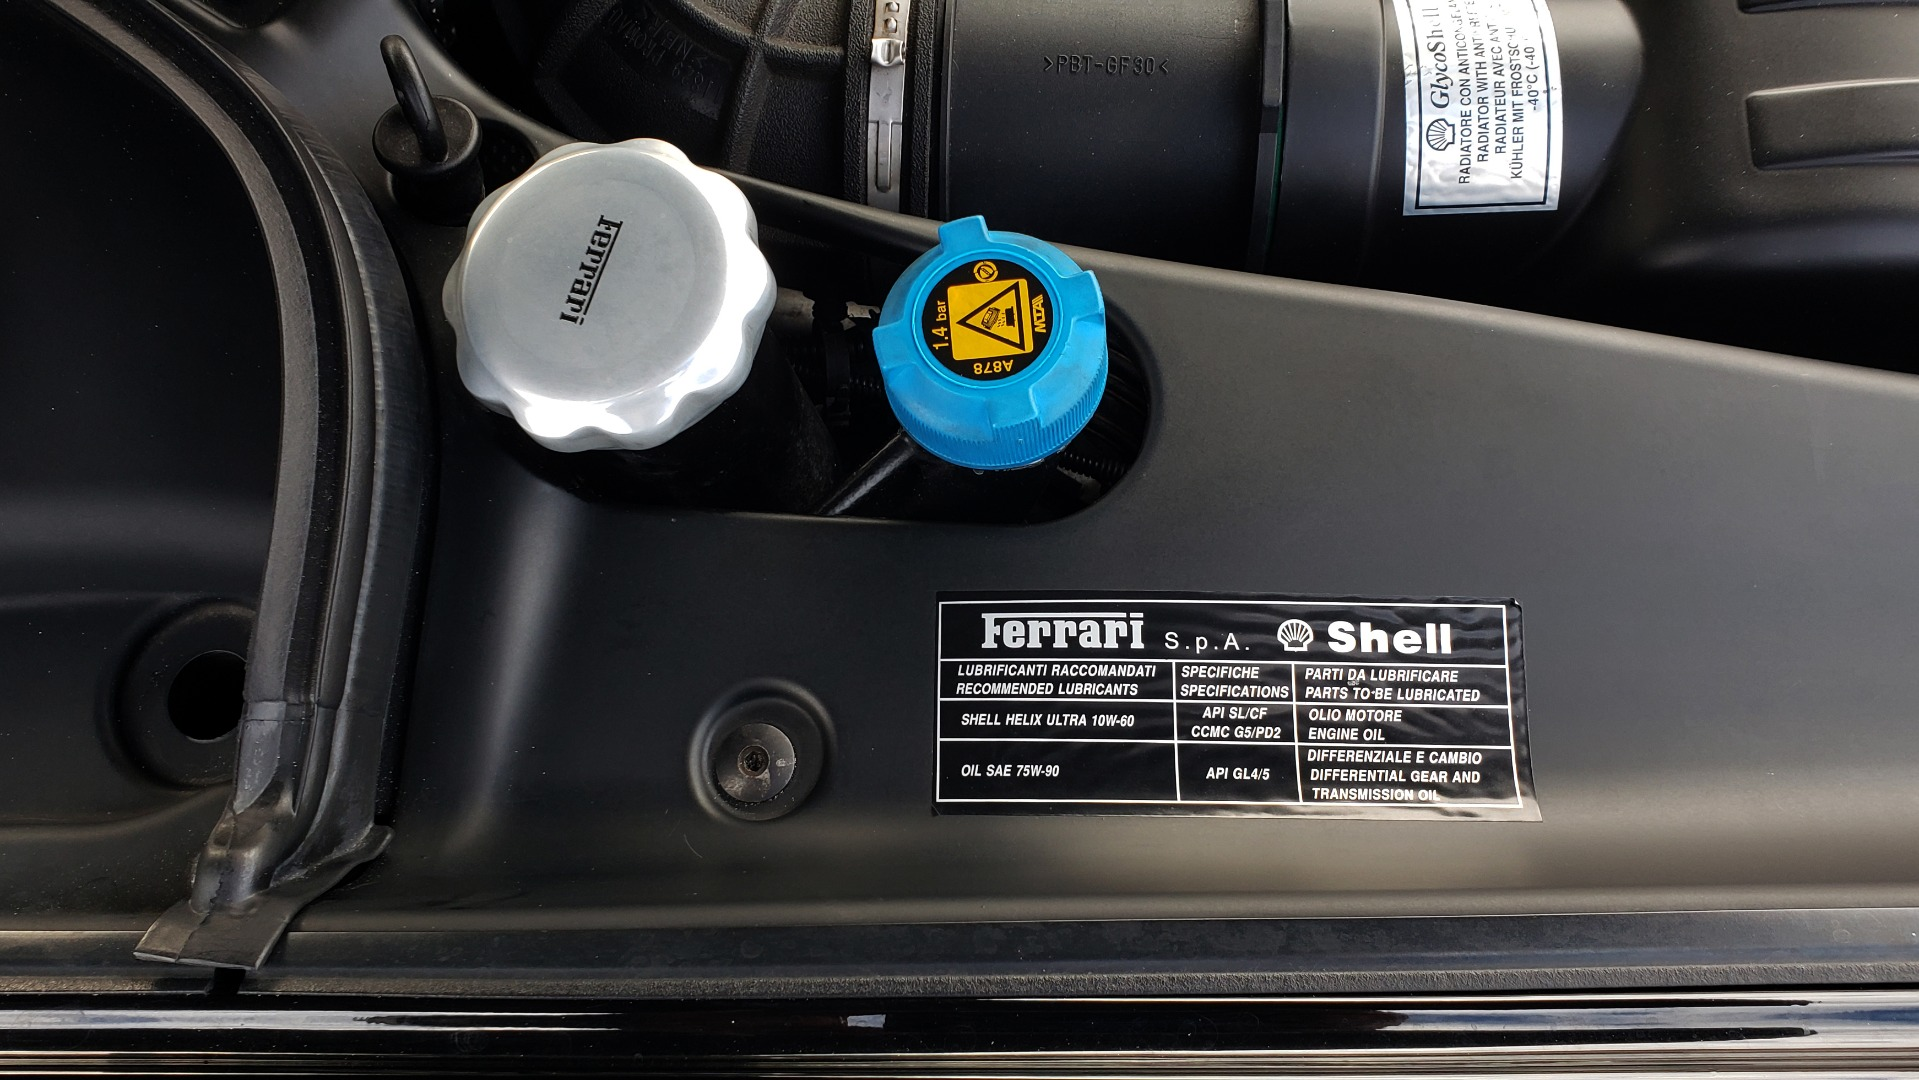 Used 2007 Ferrari 599 GTB FIORANO HGTE / V12 / F1 TRANS / NAV / BOSE / CUSTOM WHEELS for sale $109,999 at Formula Imports in Charlotte NC 28227 62